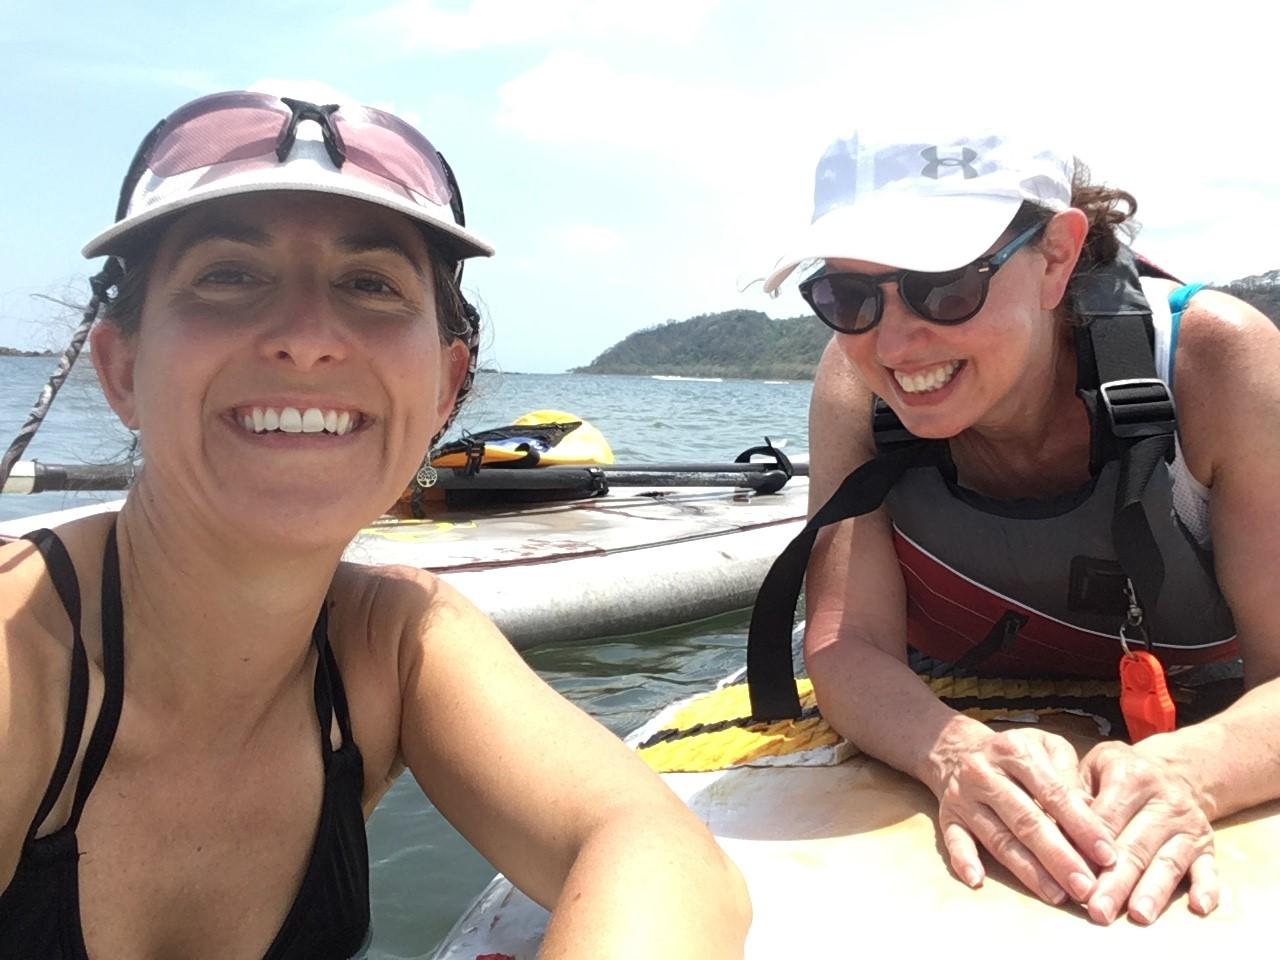 Lisa and Colleen @ Sansara Yoga & Surf Resort, Panama April 2018